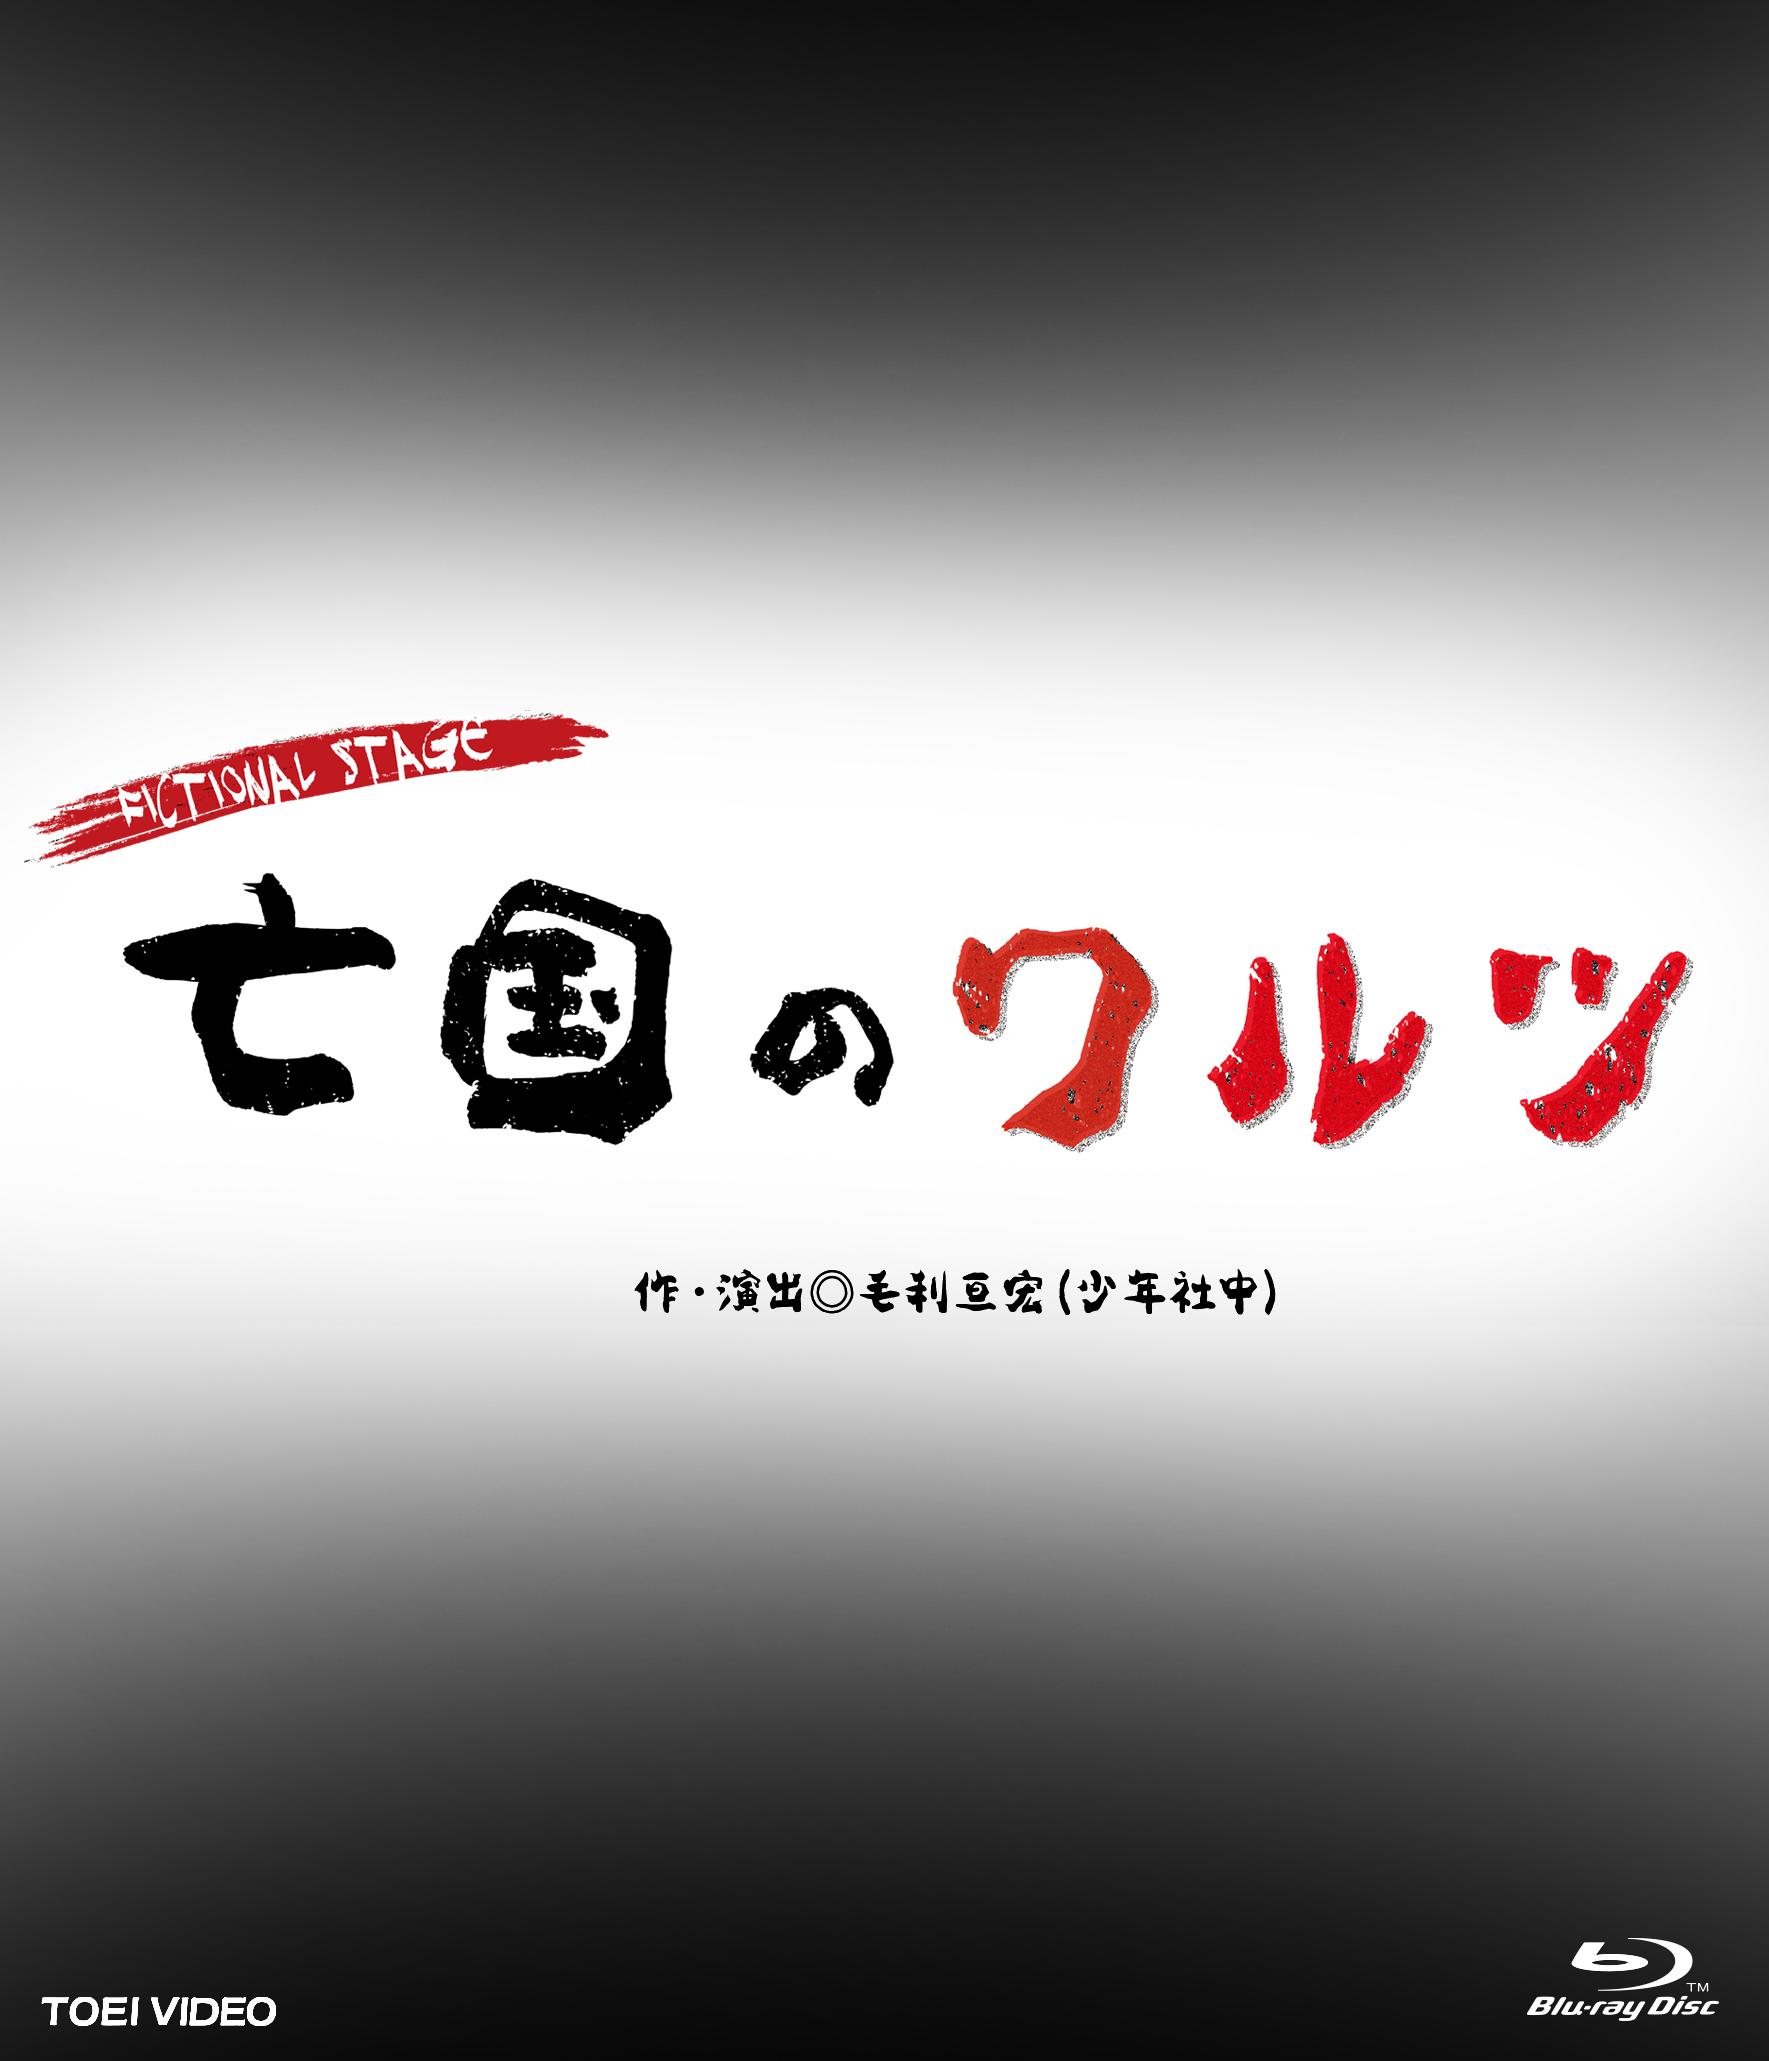 【Blu-ray】FICTIONAL STAGE「亡国のワルツ」限定予約版(スペシャルディスク付き)